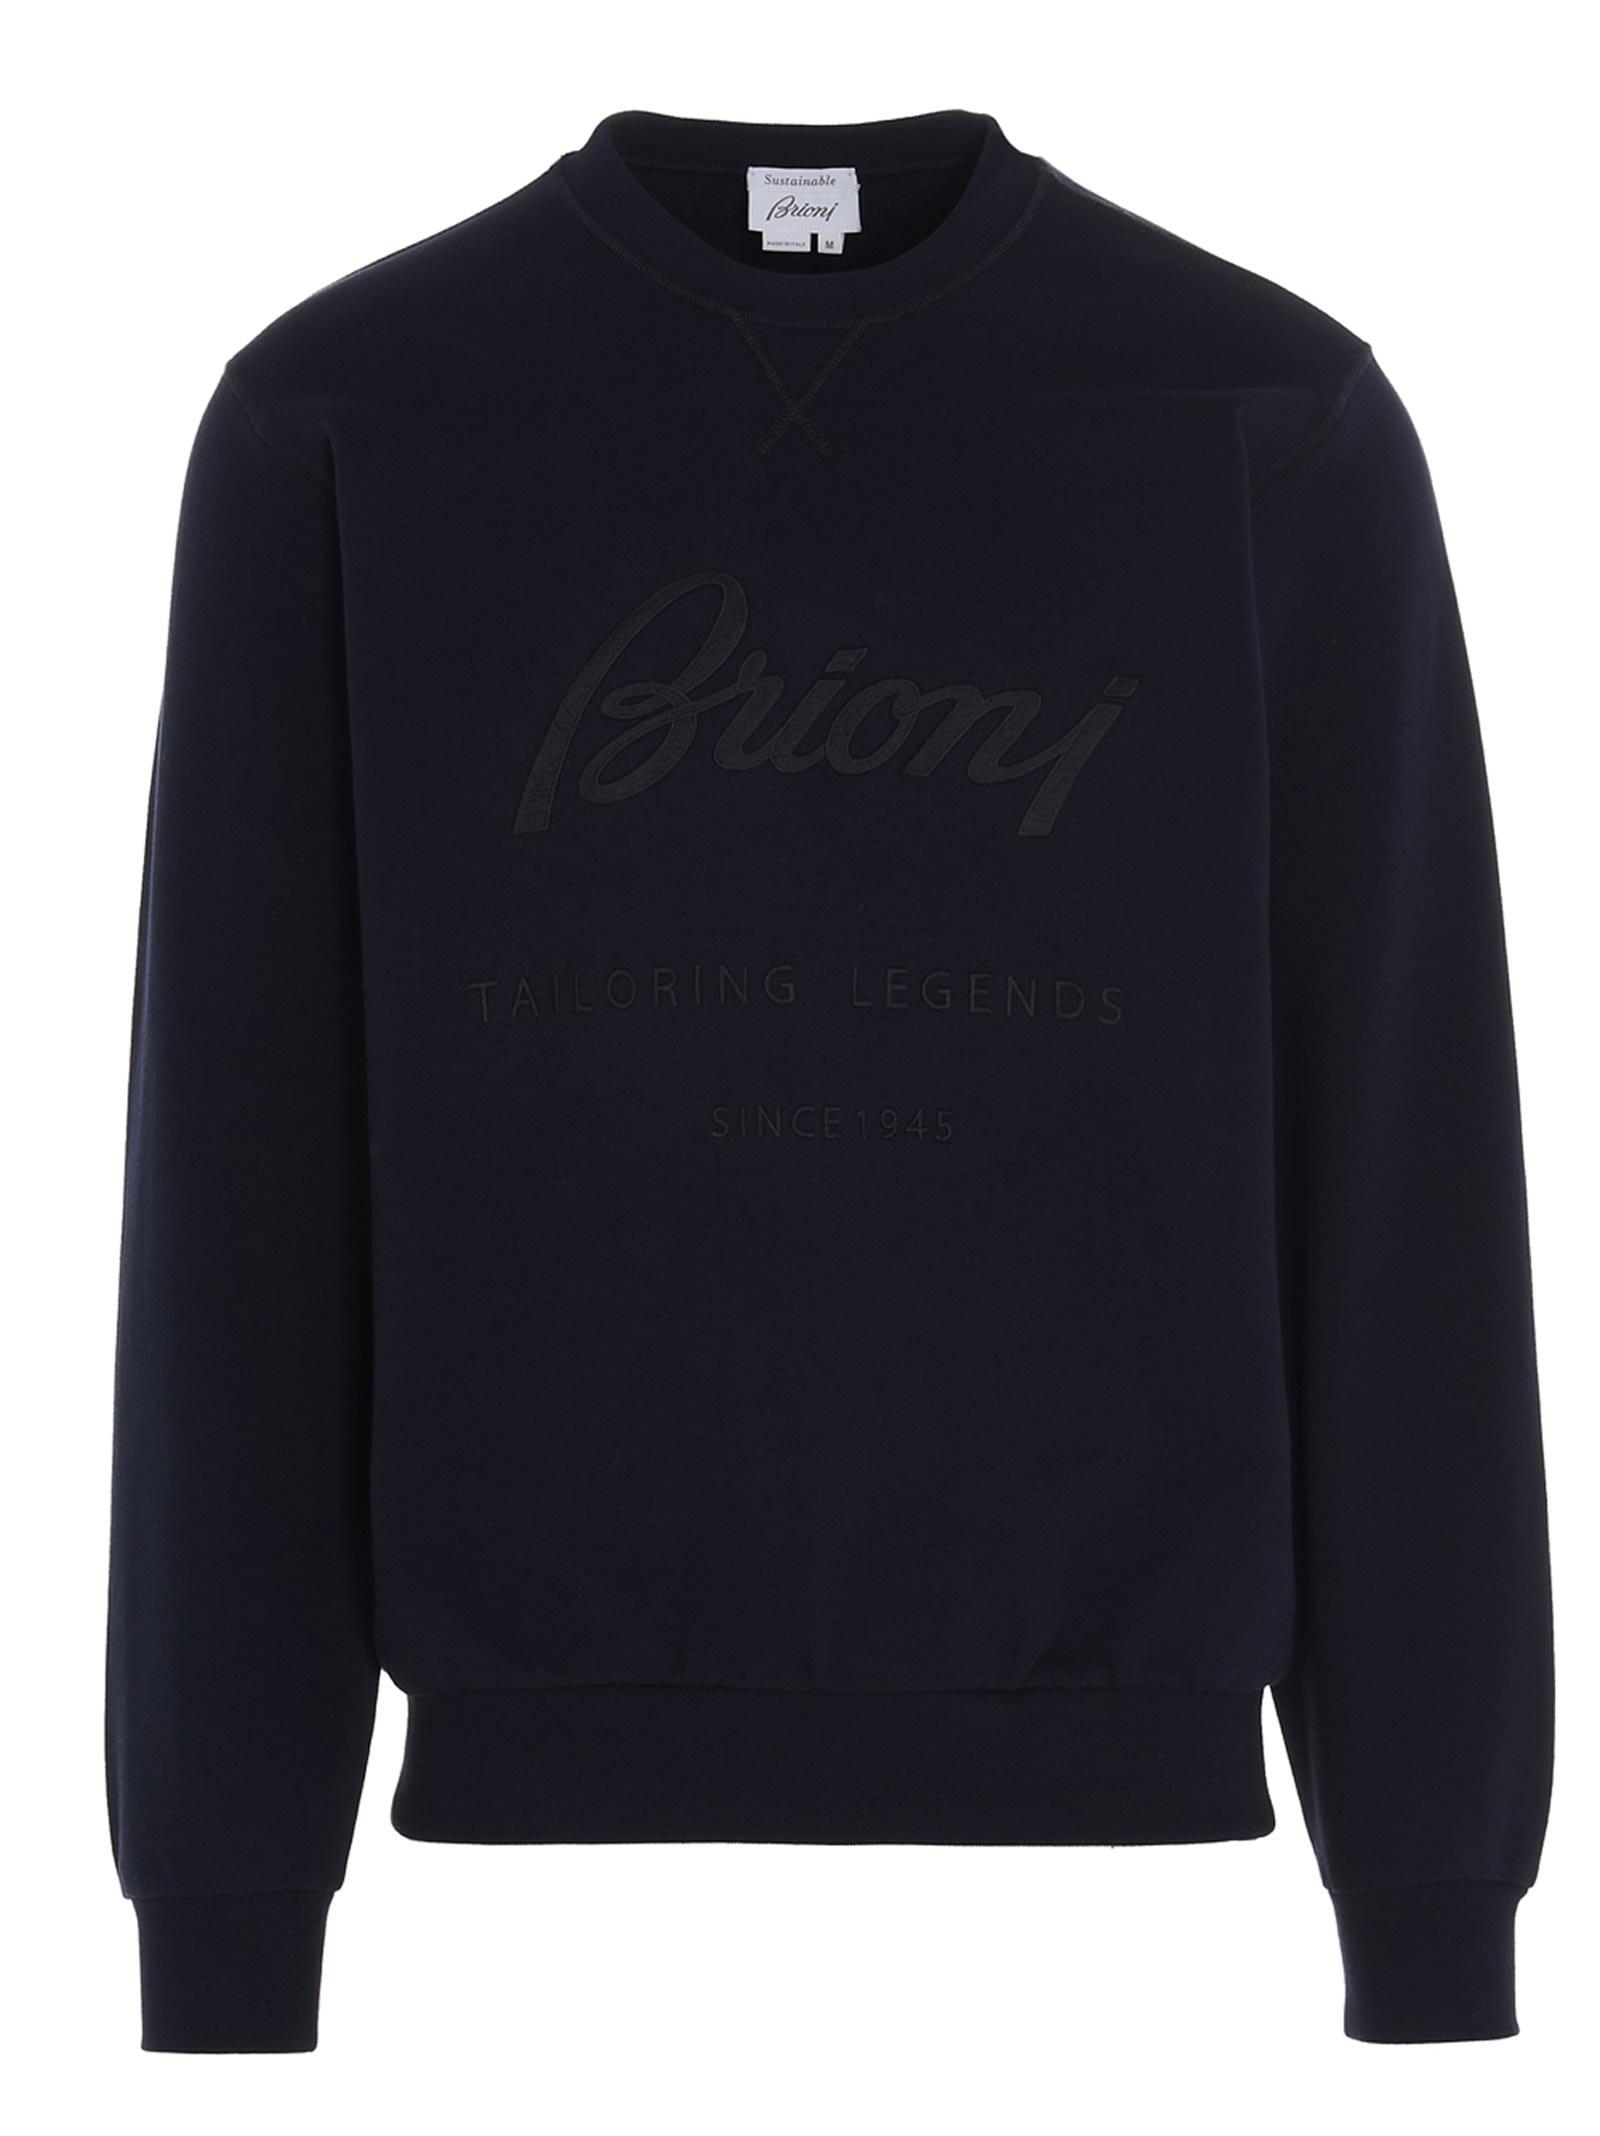 Brioni Clothing SWEATER